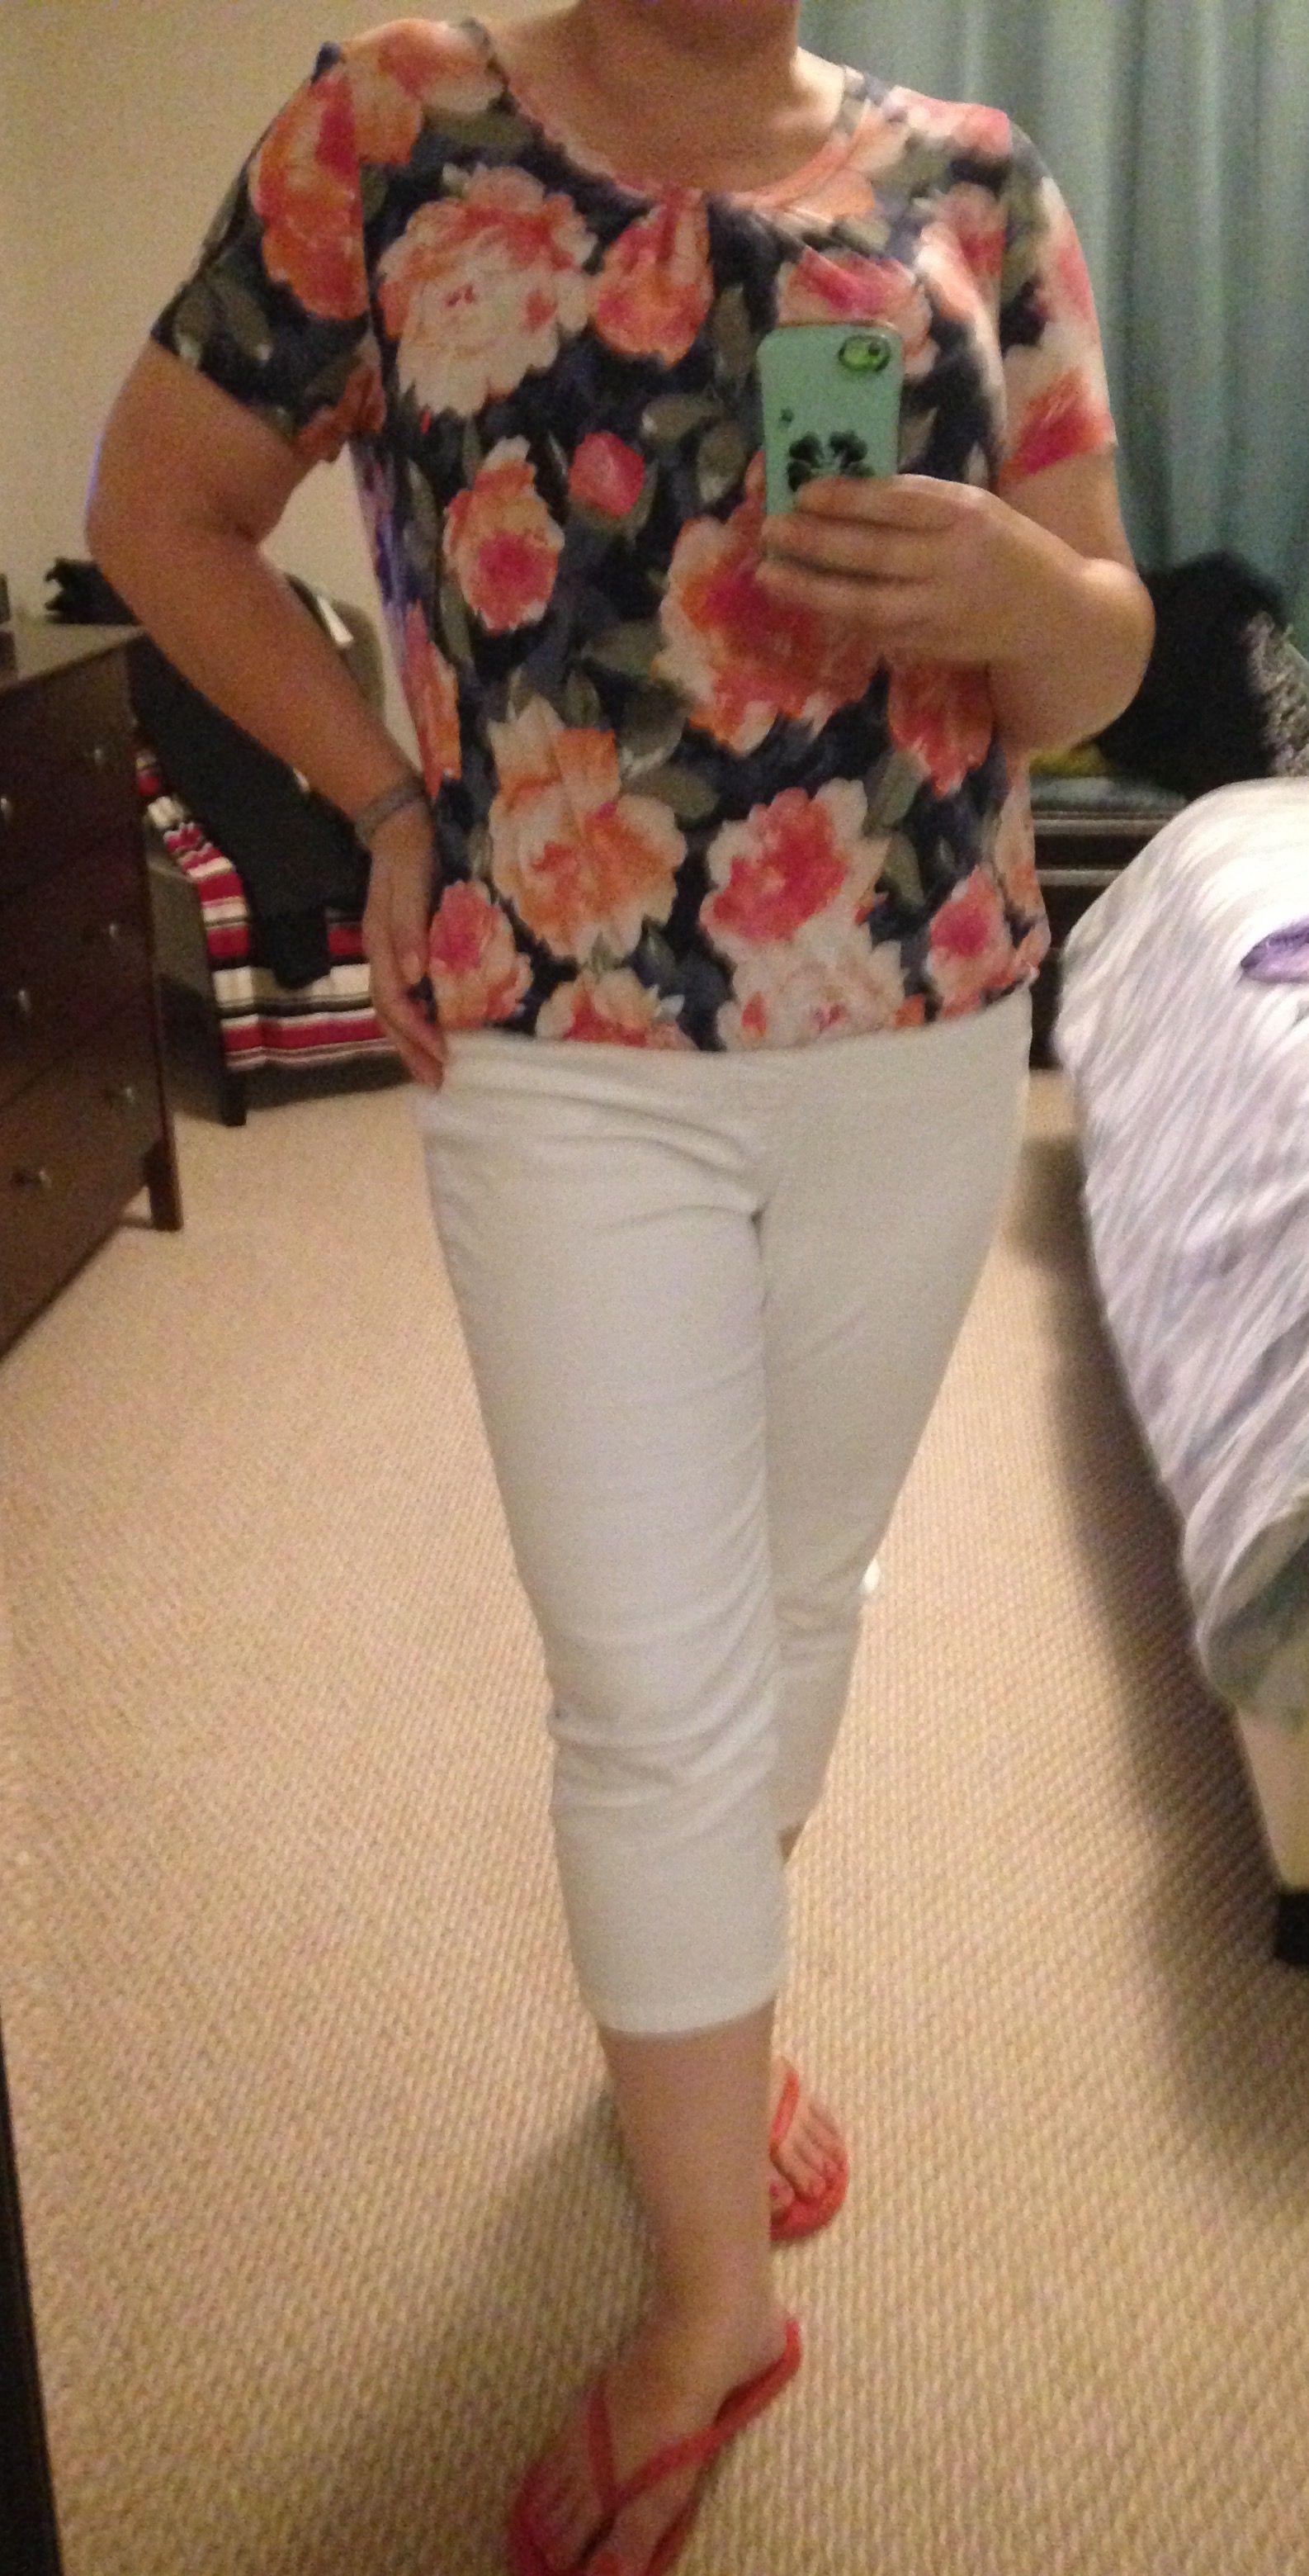 66b63de8a85e0 This is one of my g-to casual outfits. The t-shirt has short sleeves ...